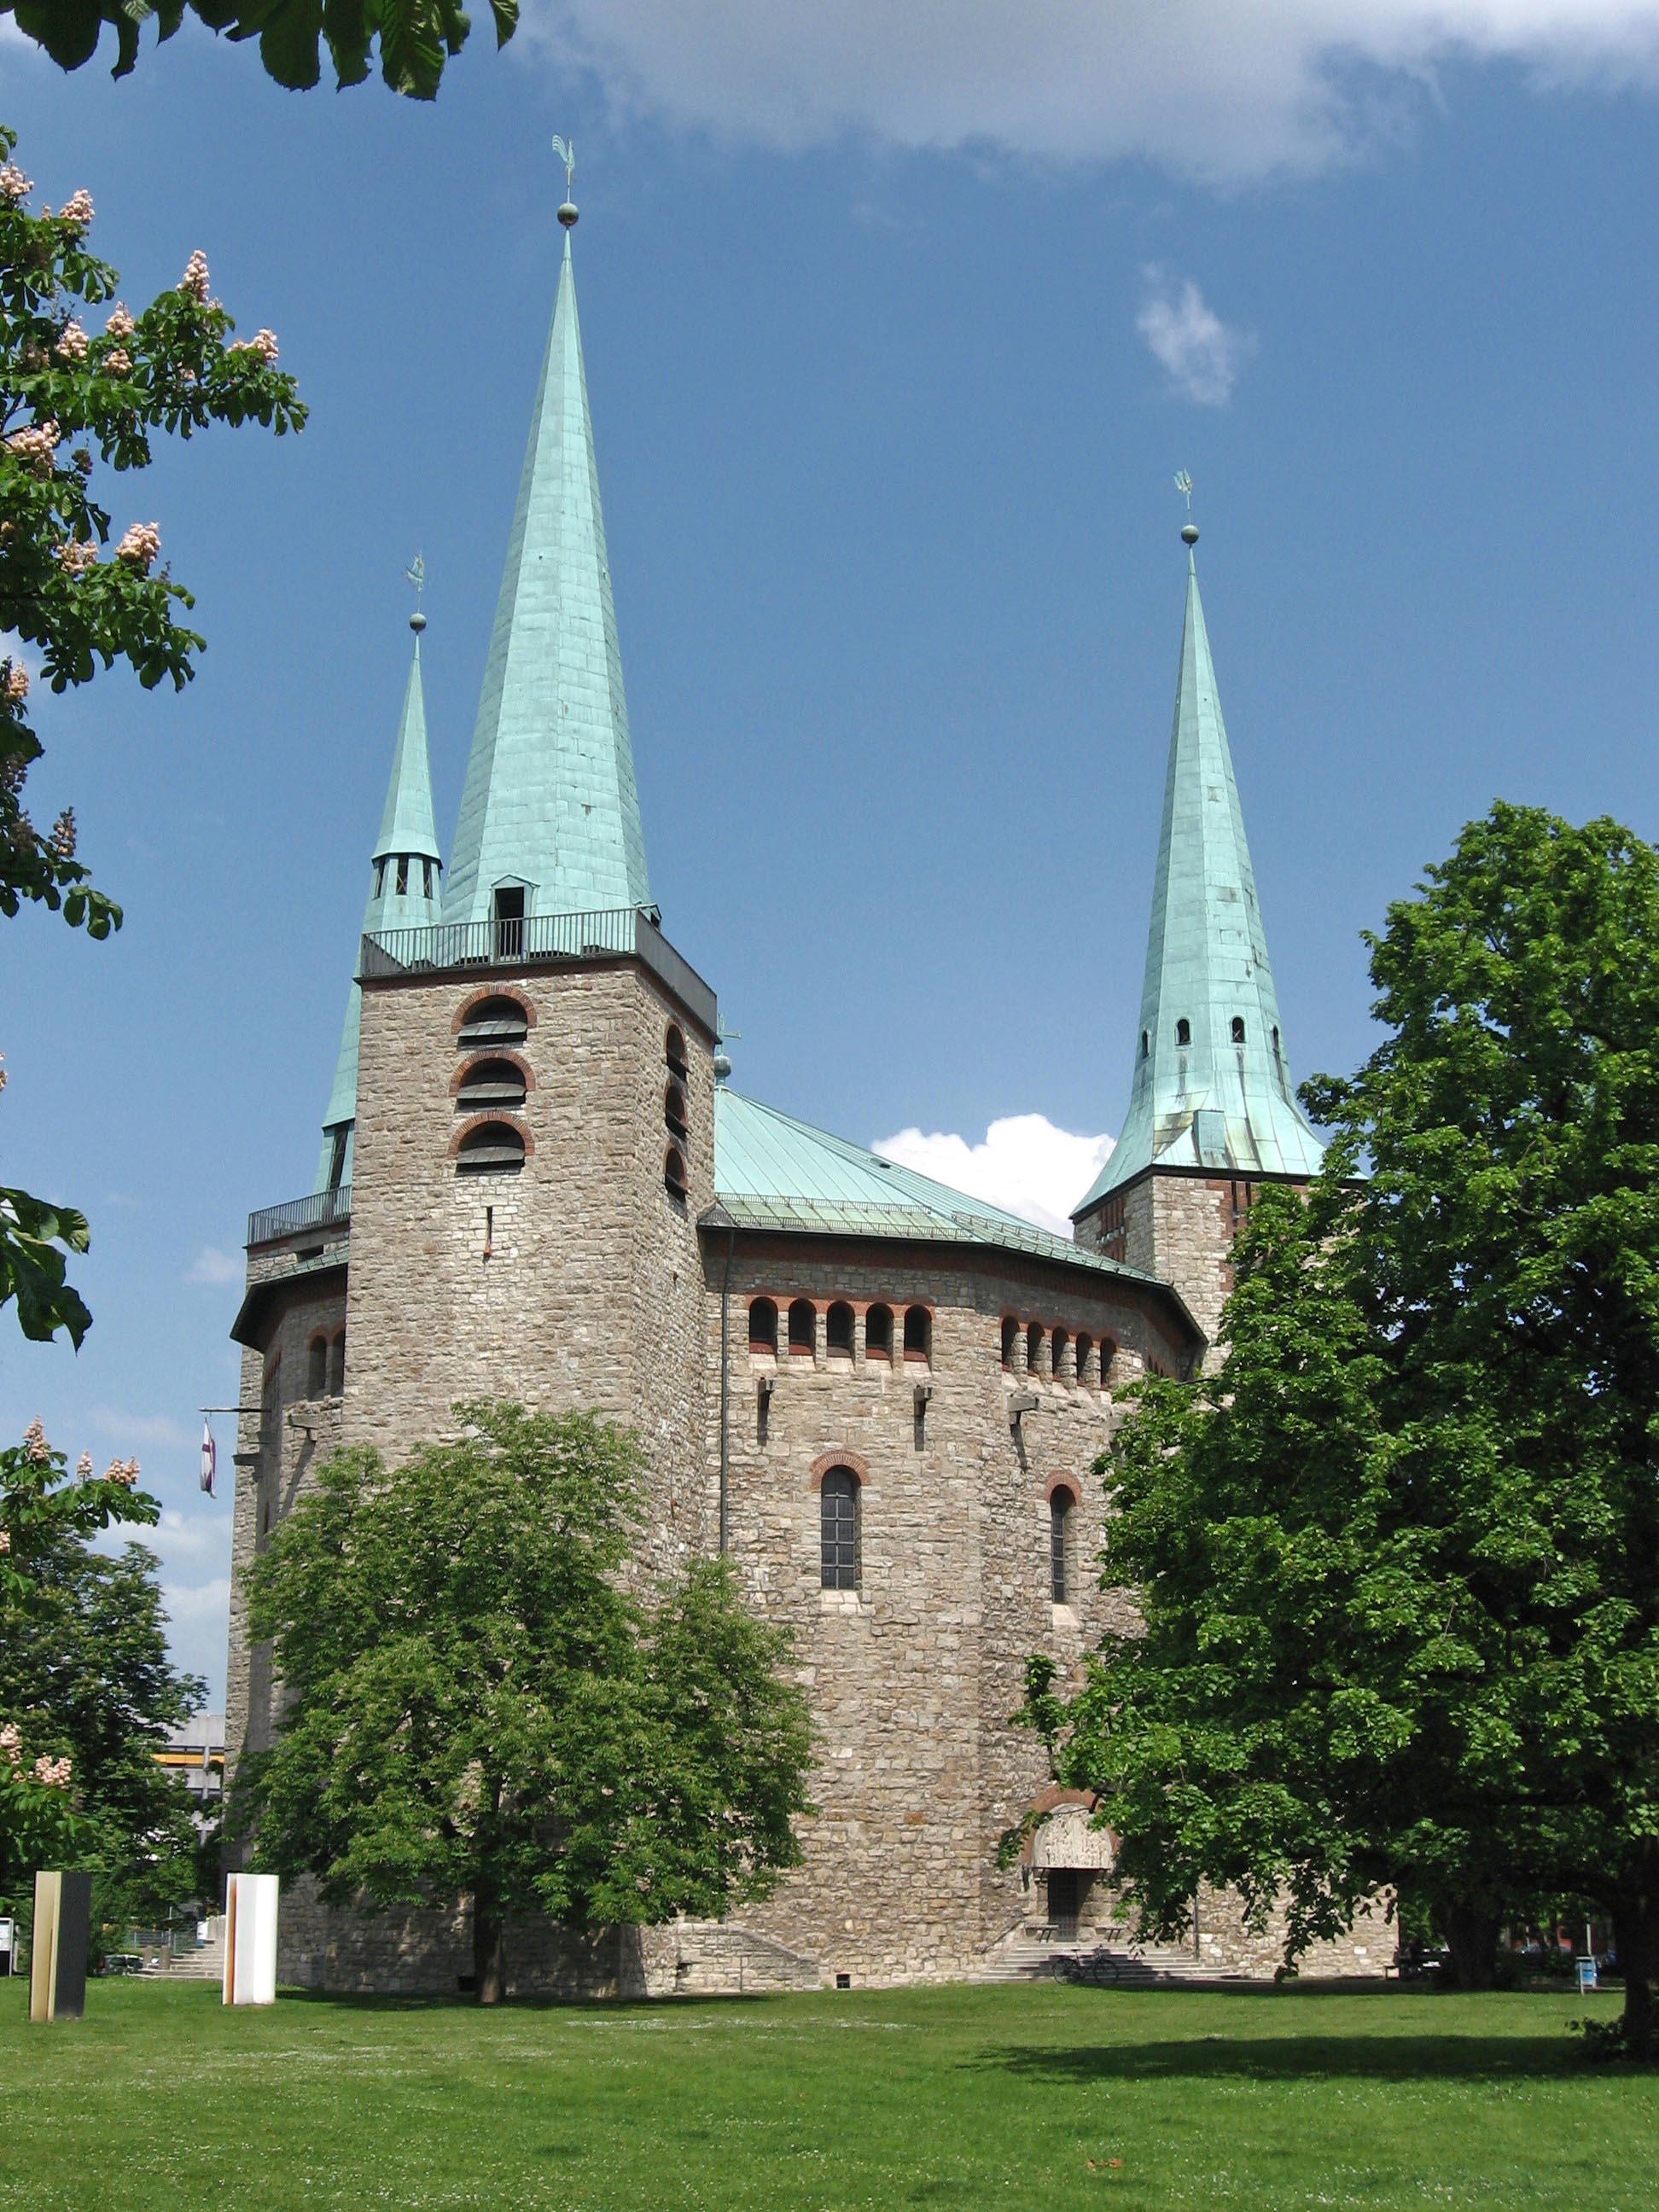 Reformations-Gedächtnis-Kirche, Nürnberg. Foto: Privat